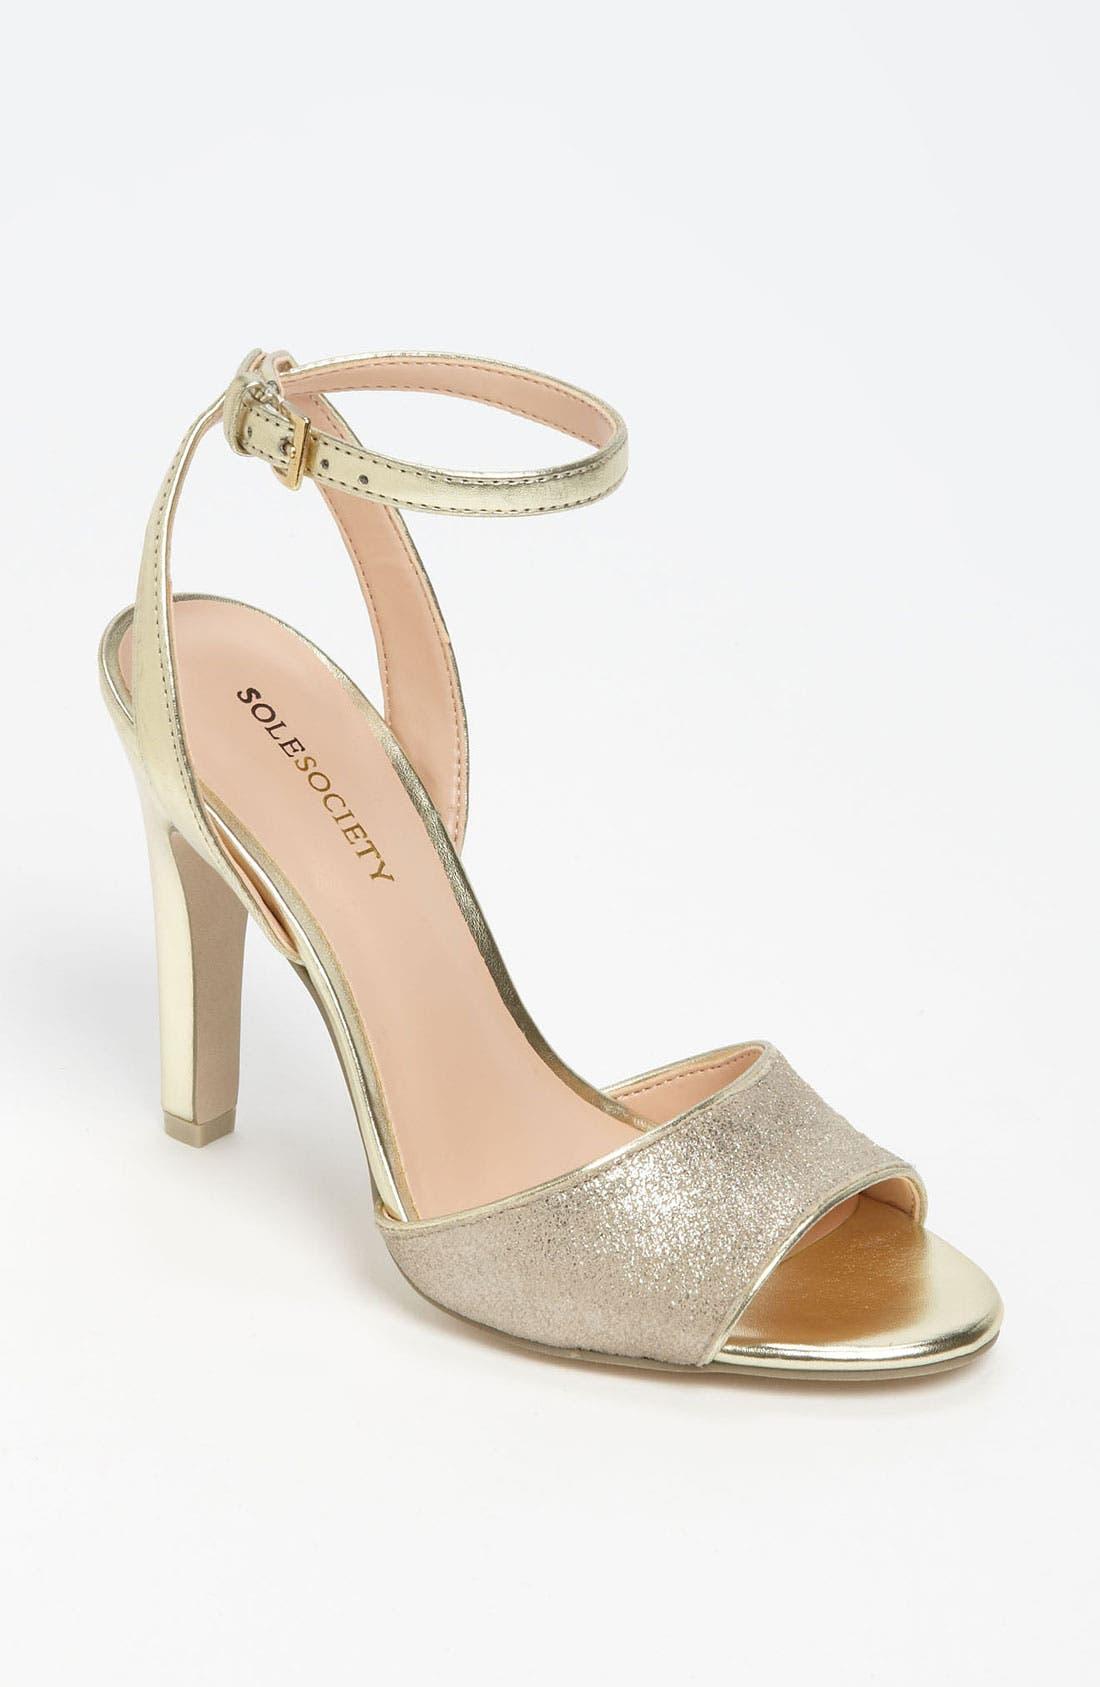 Alternate Image 1 Selected - Sole Society 'Kimberlee' Sandal